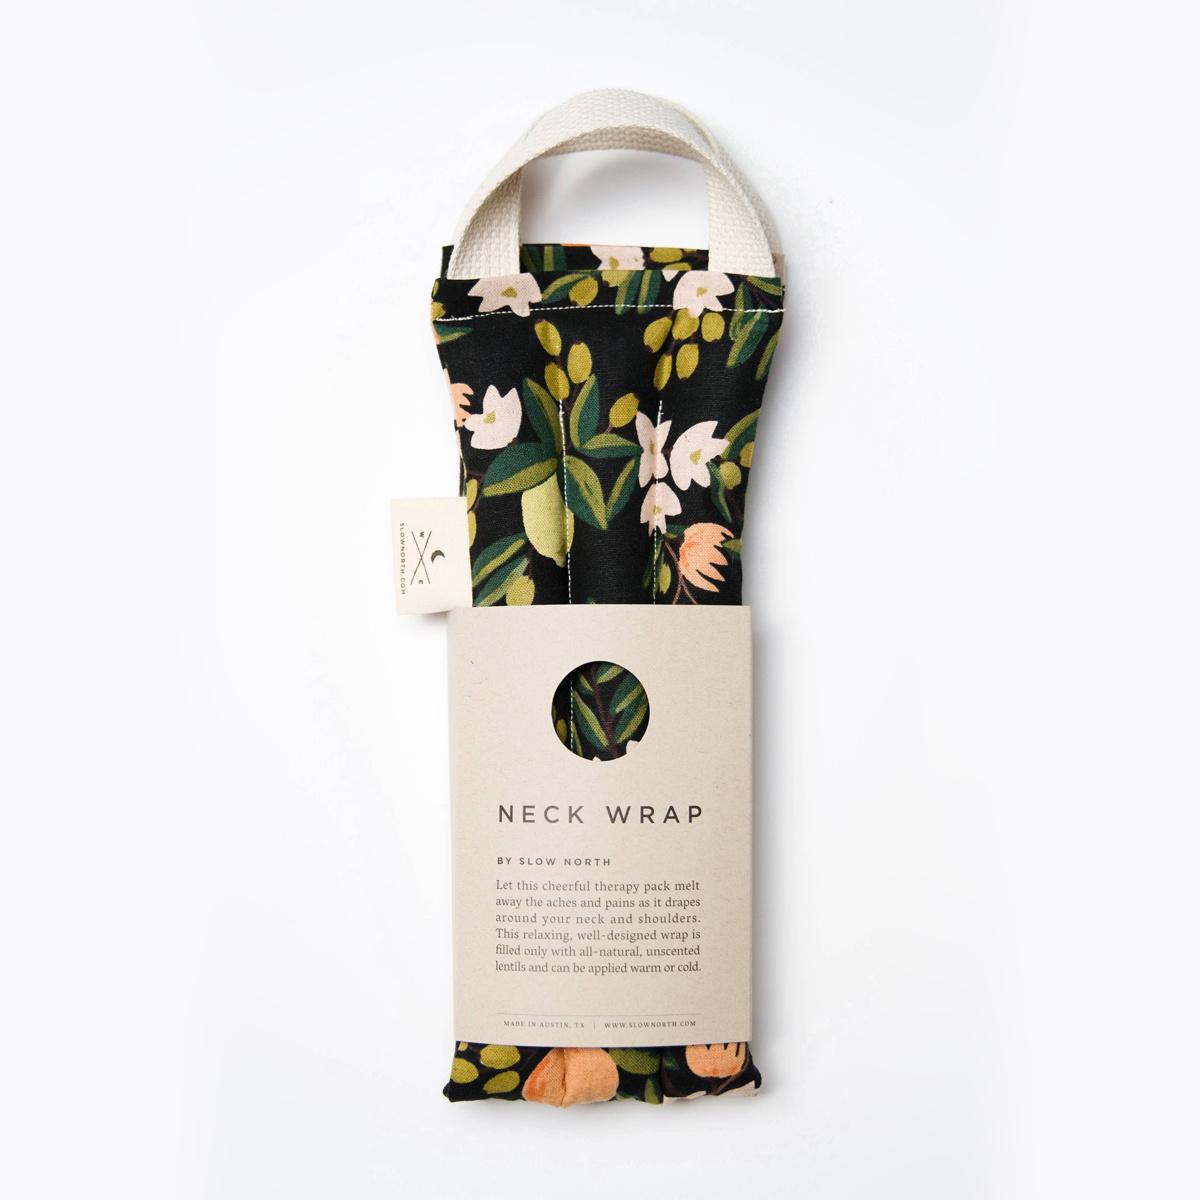 Slow North - SN Slow North - Citrus Floral Neck Wrap